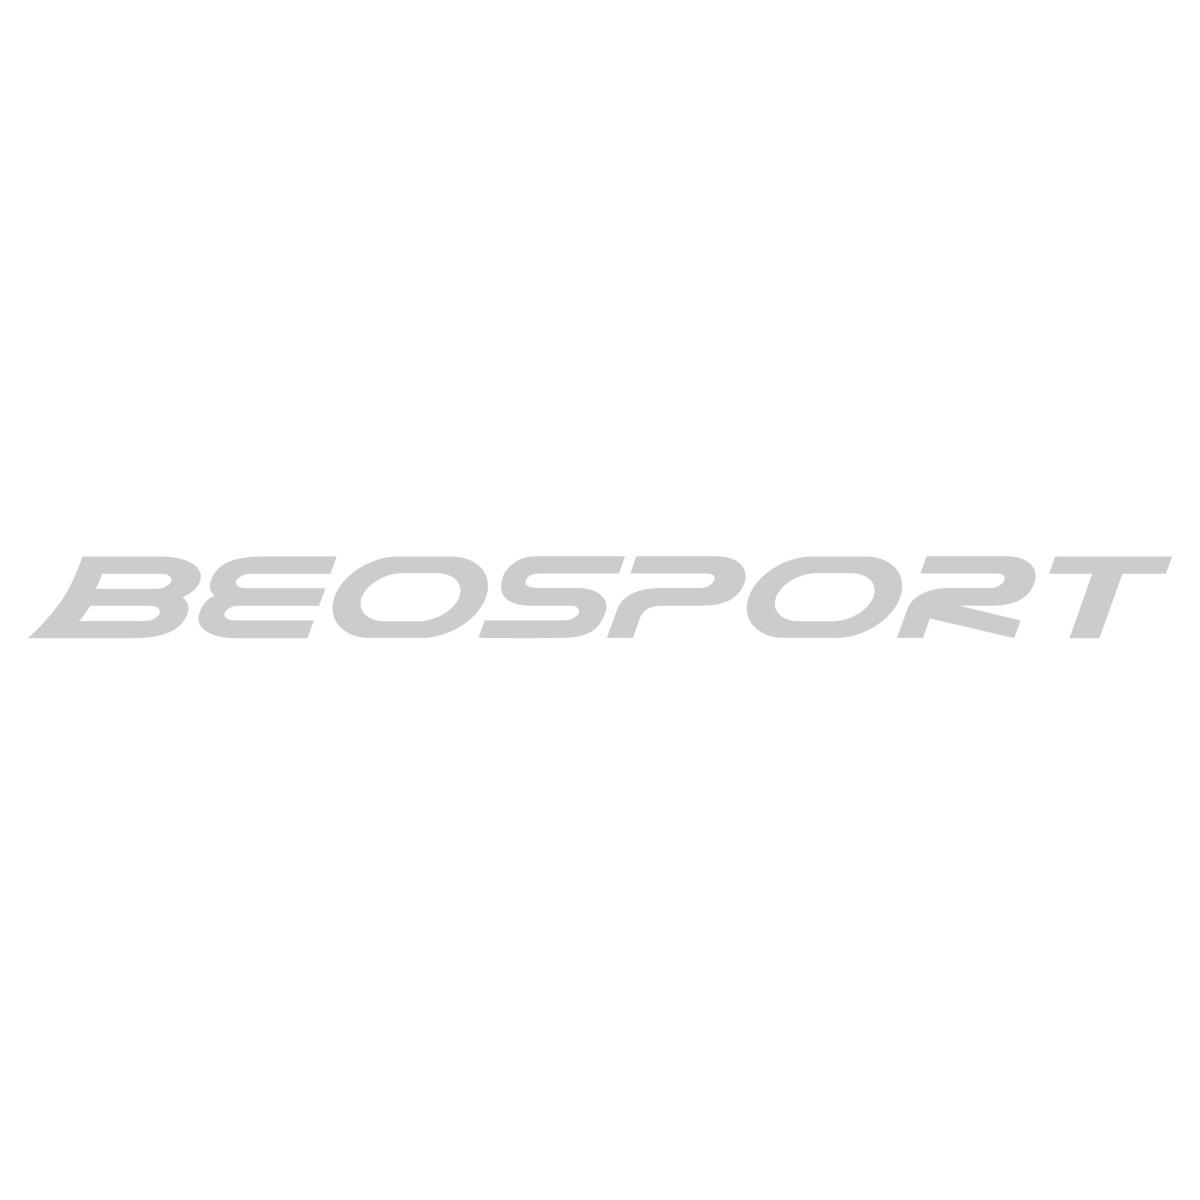 Wilson Dropshot 3 Clamshell loptice za badminton